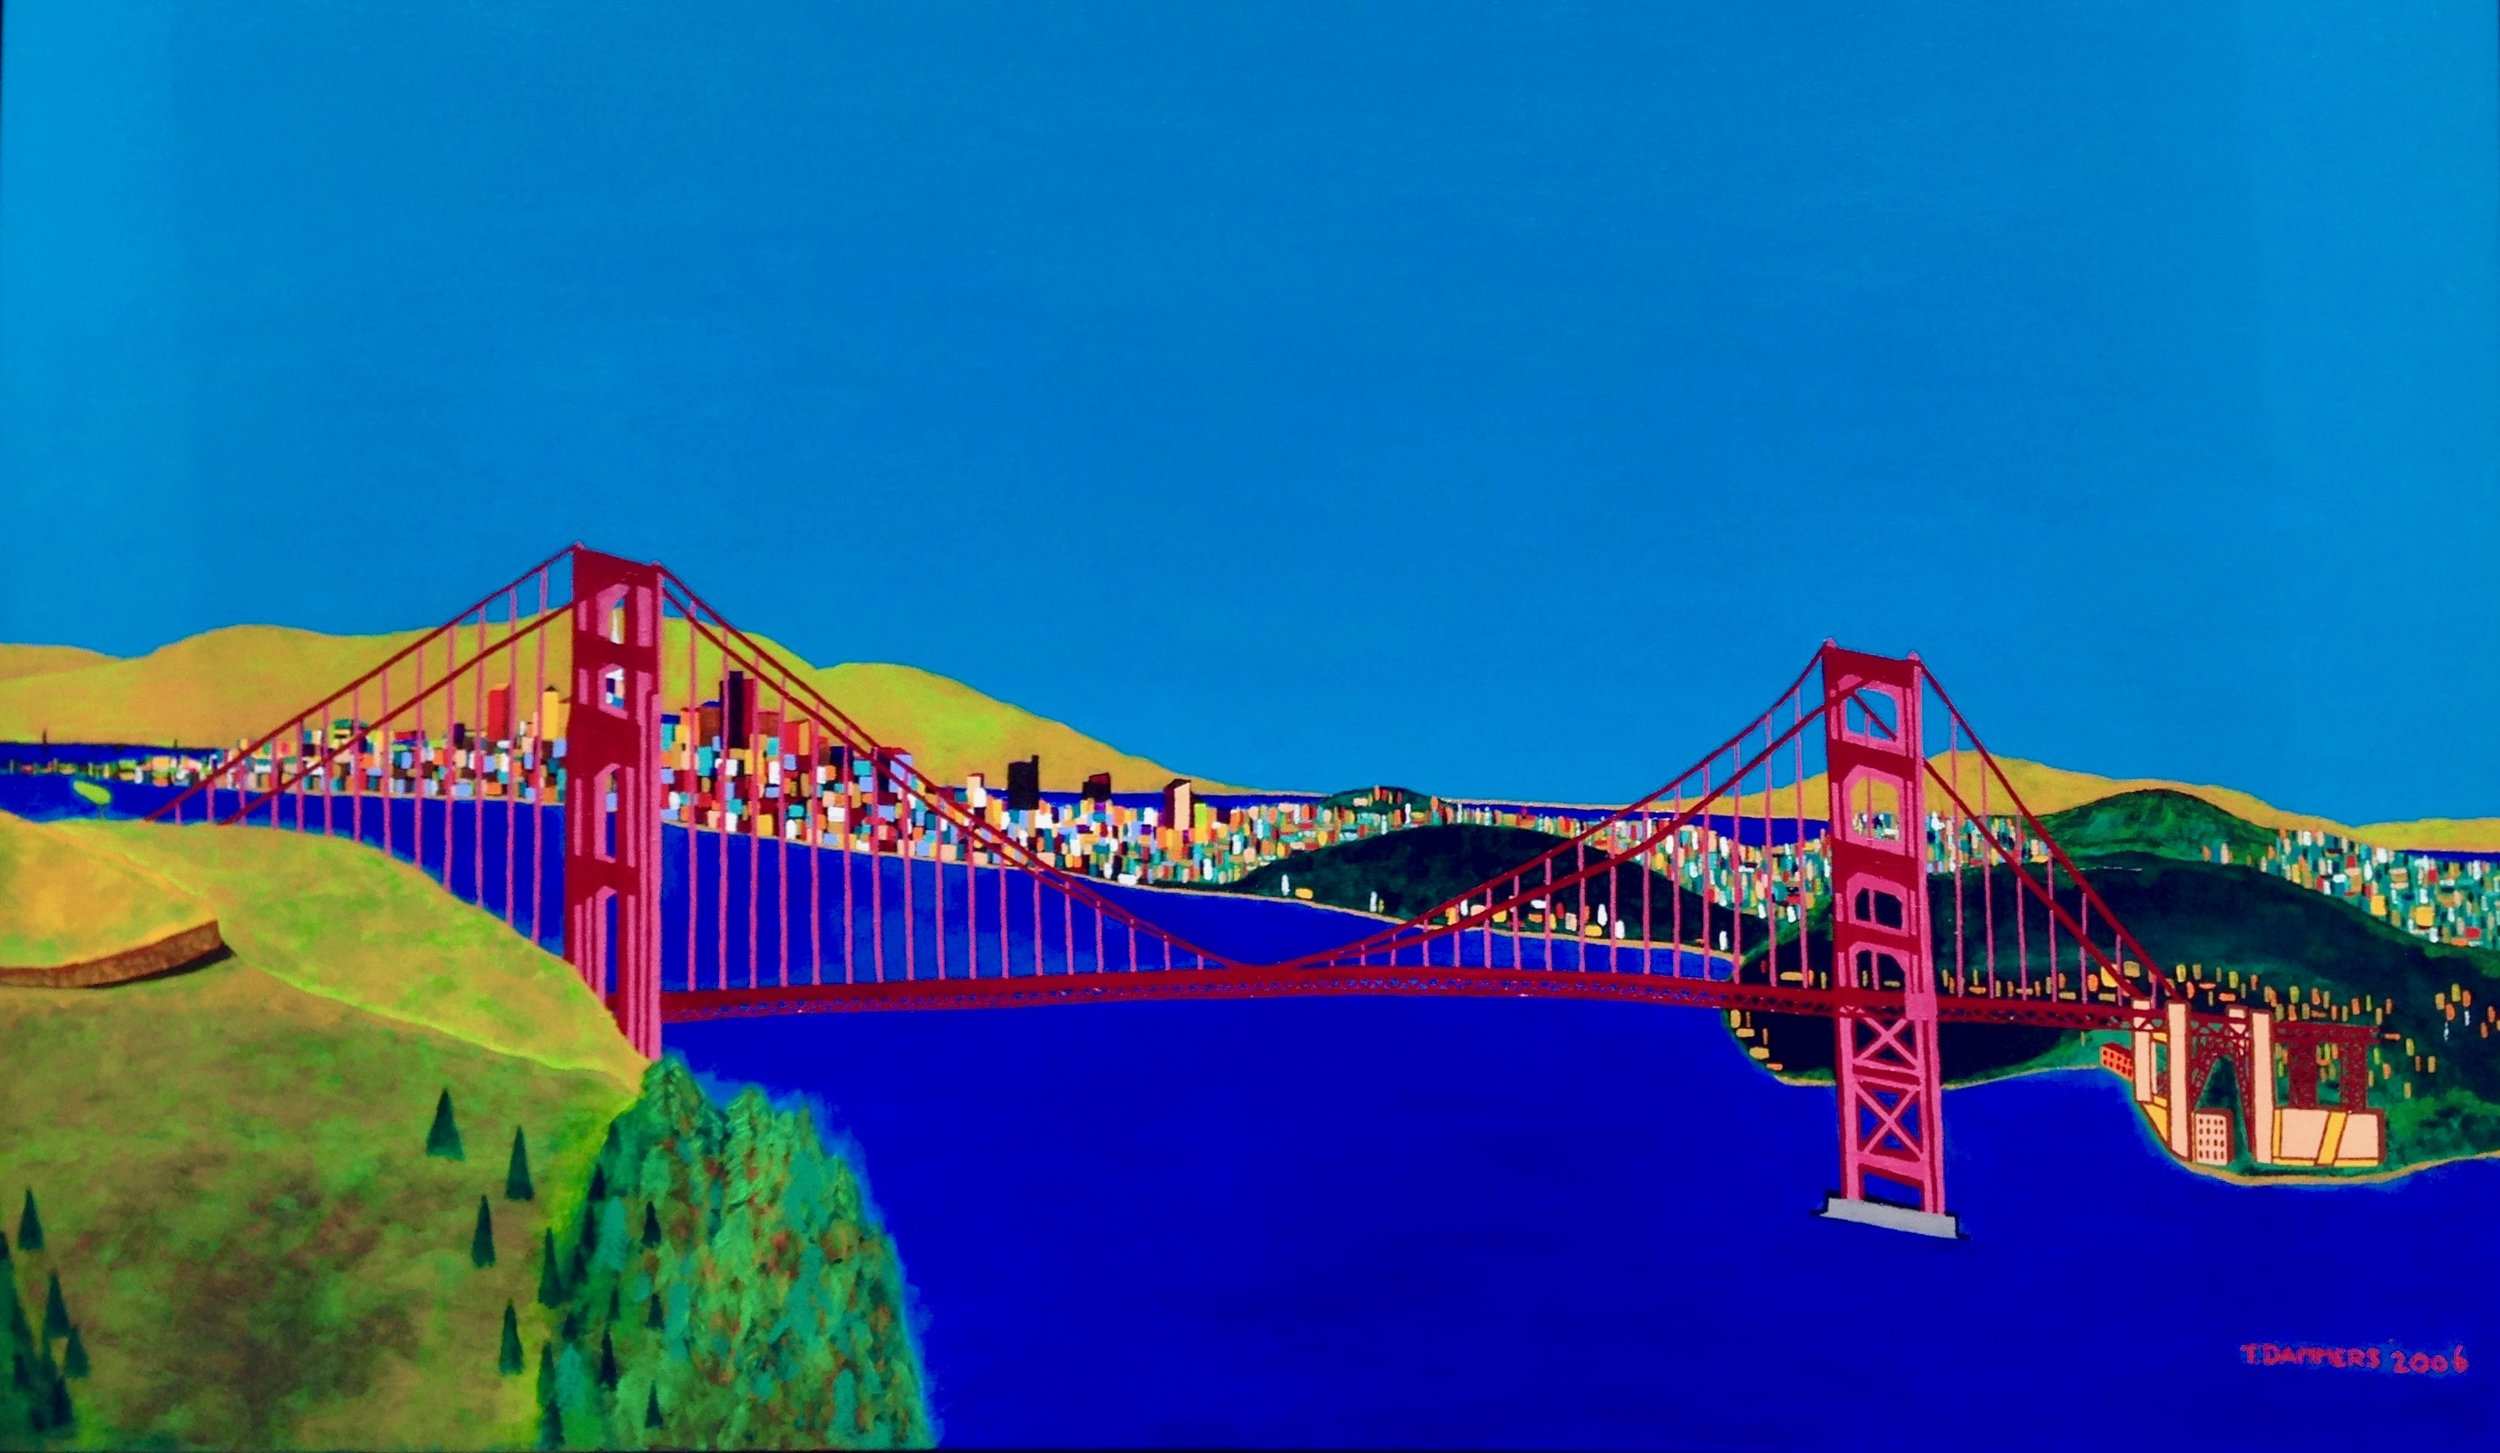 Golden Gate Bridge by Frank Dammers .jpg